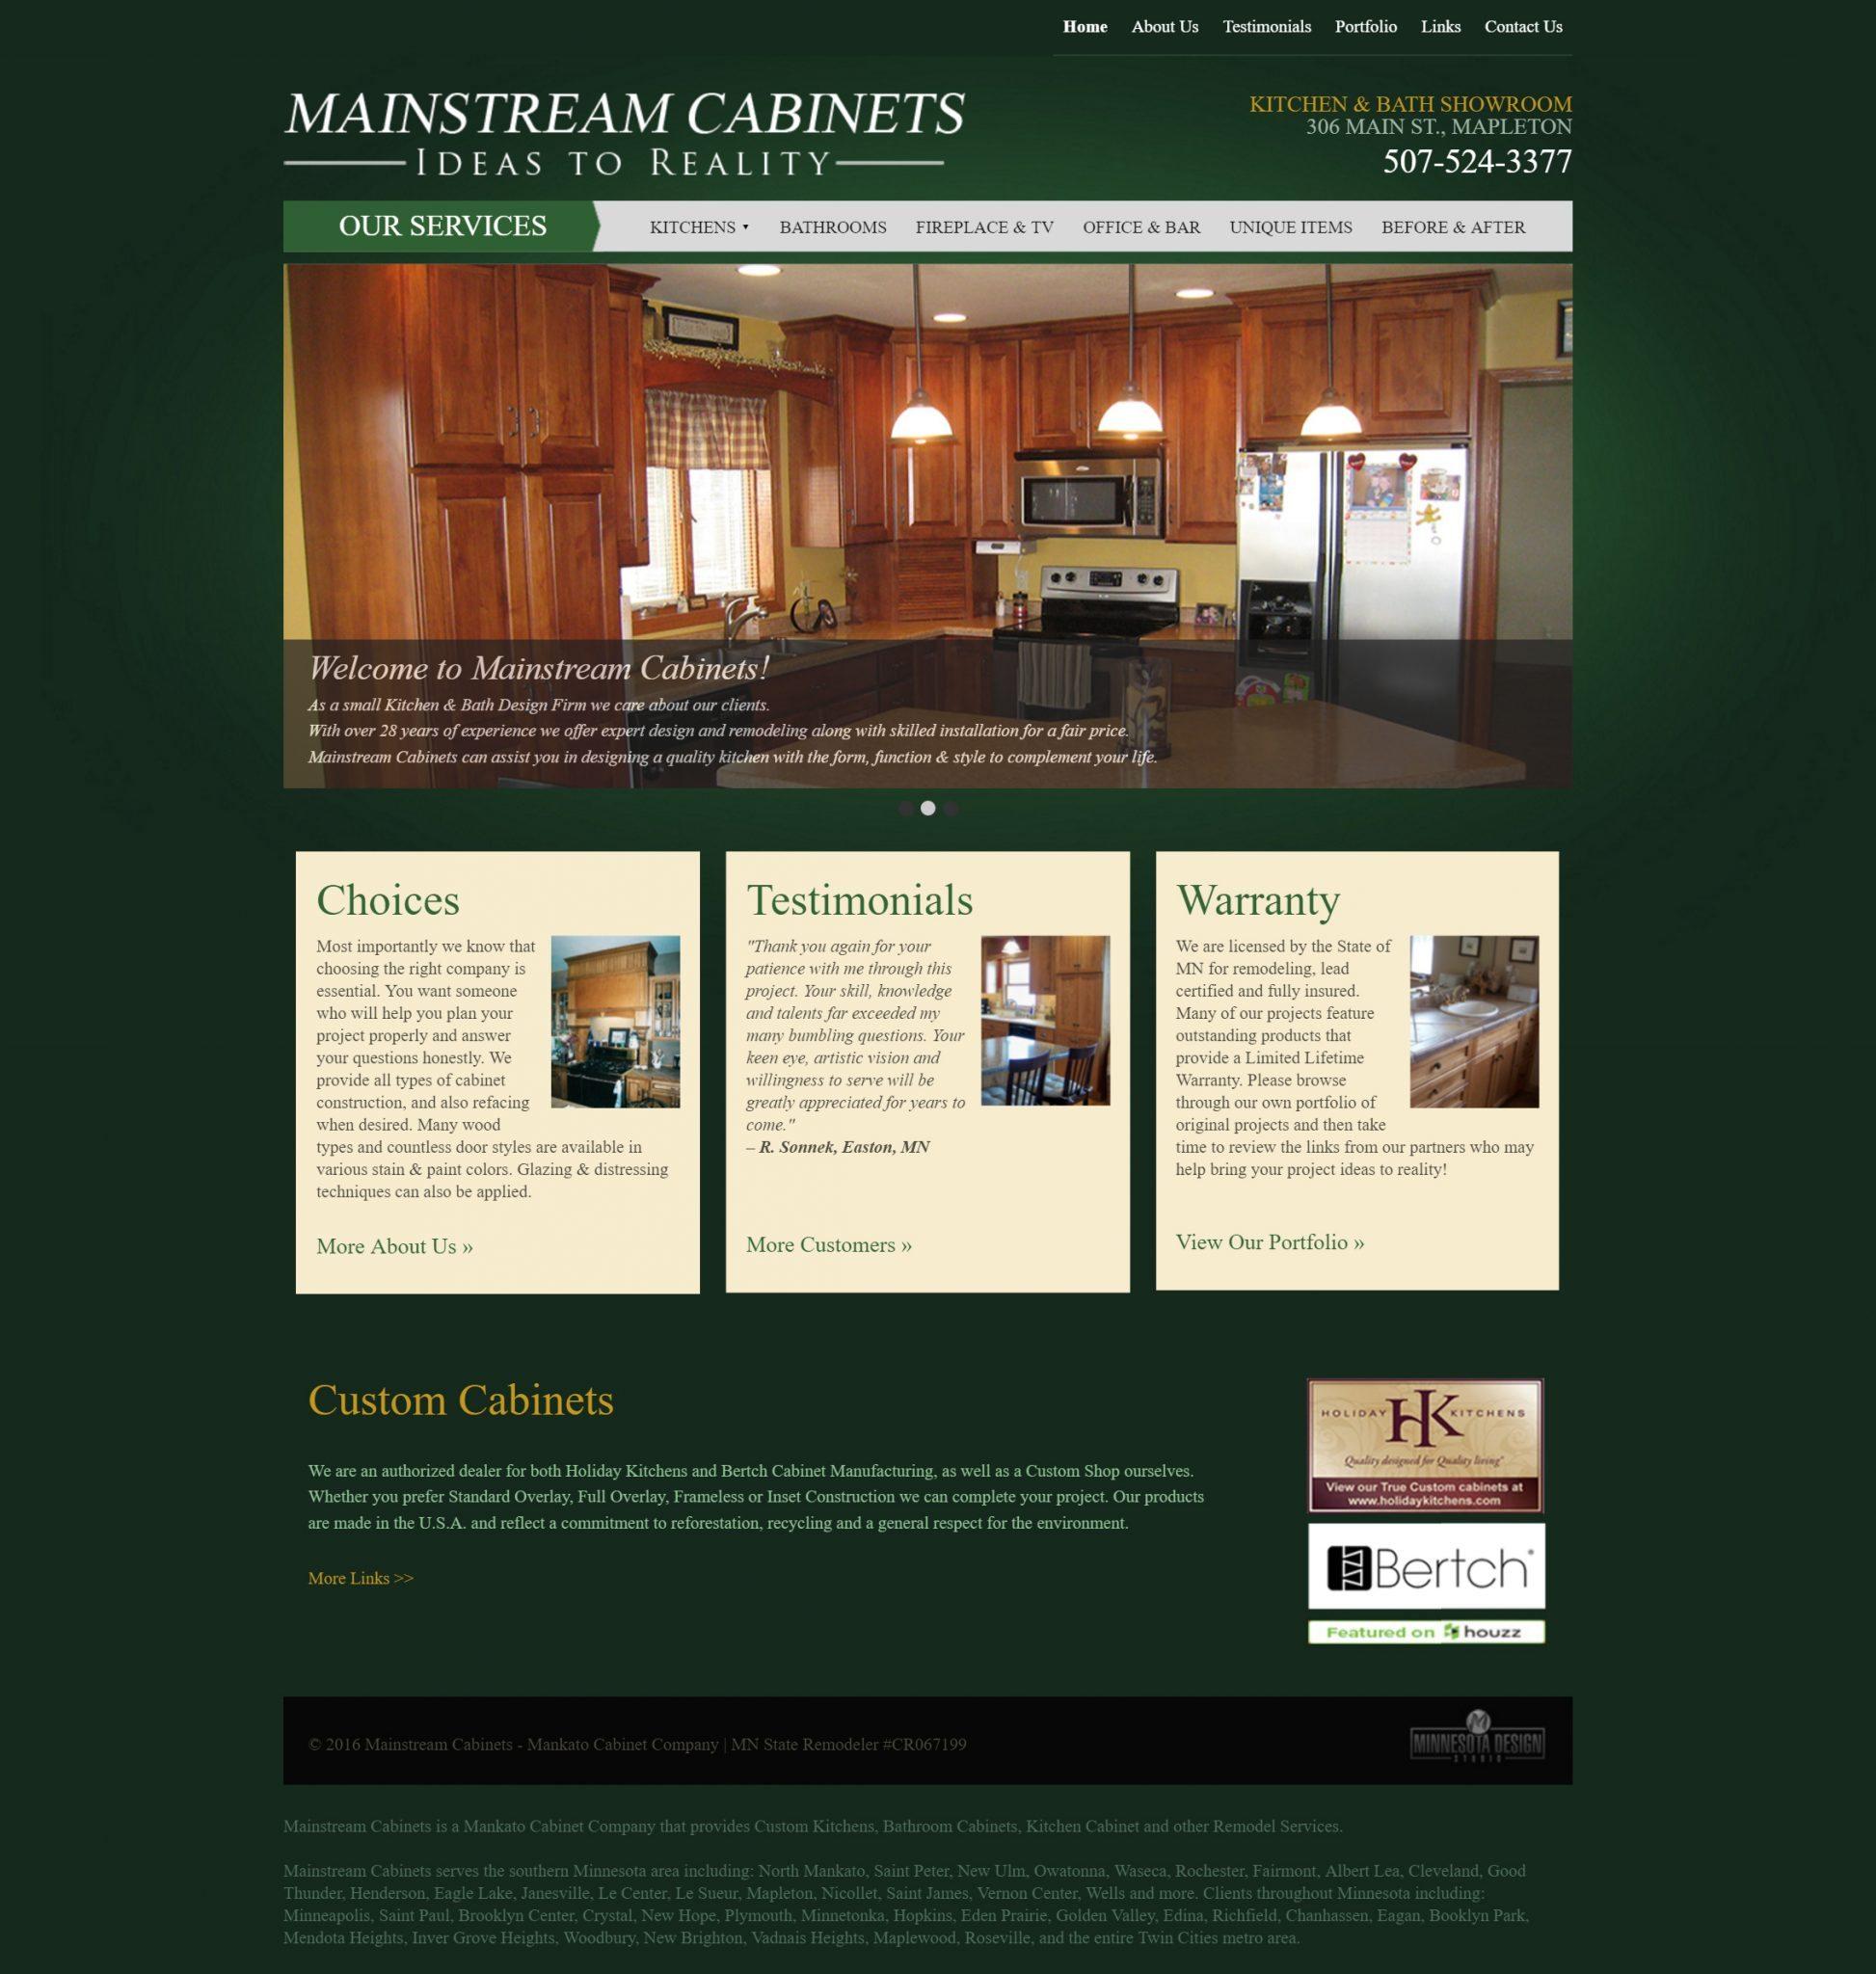 Mainstream Cabinets